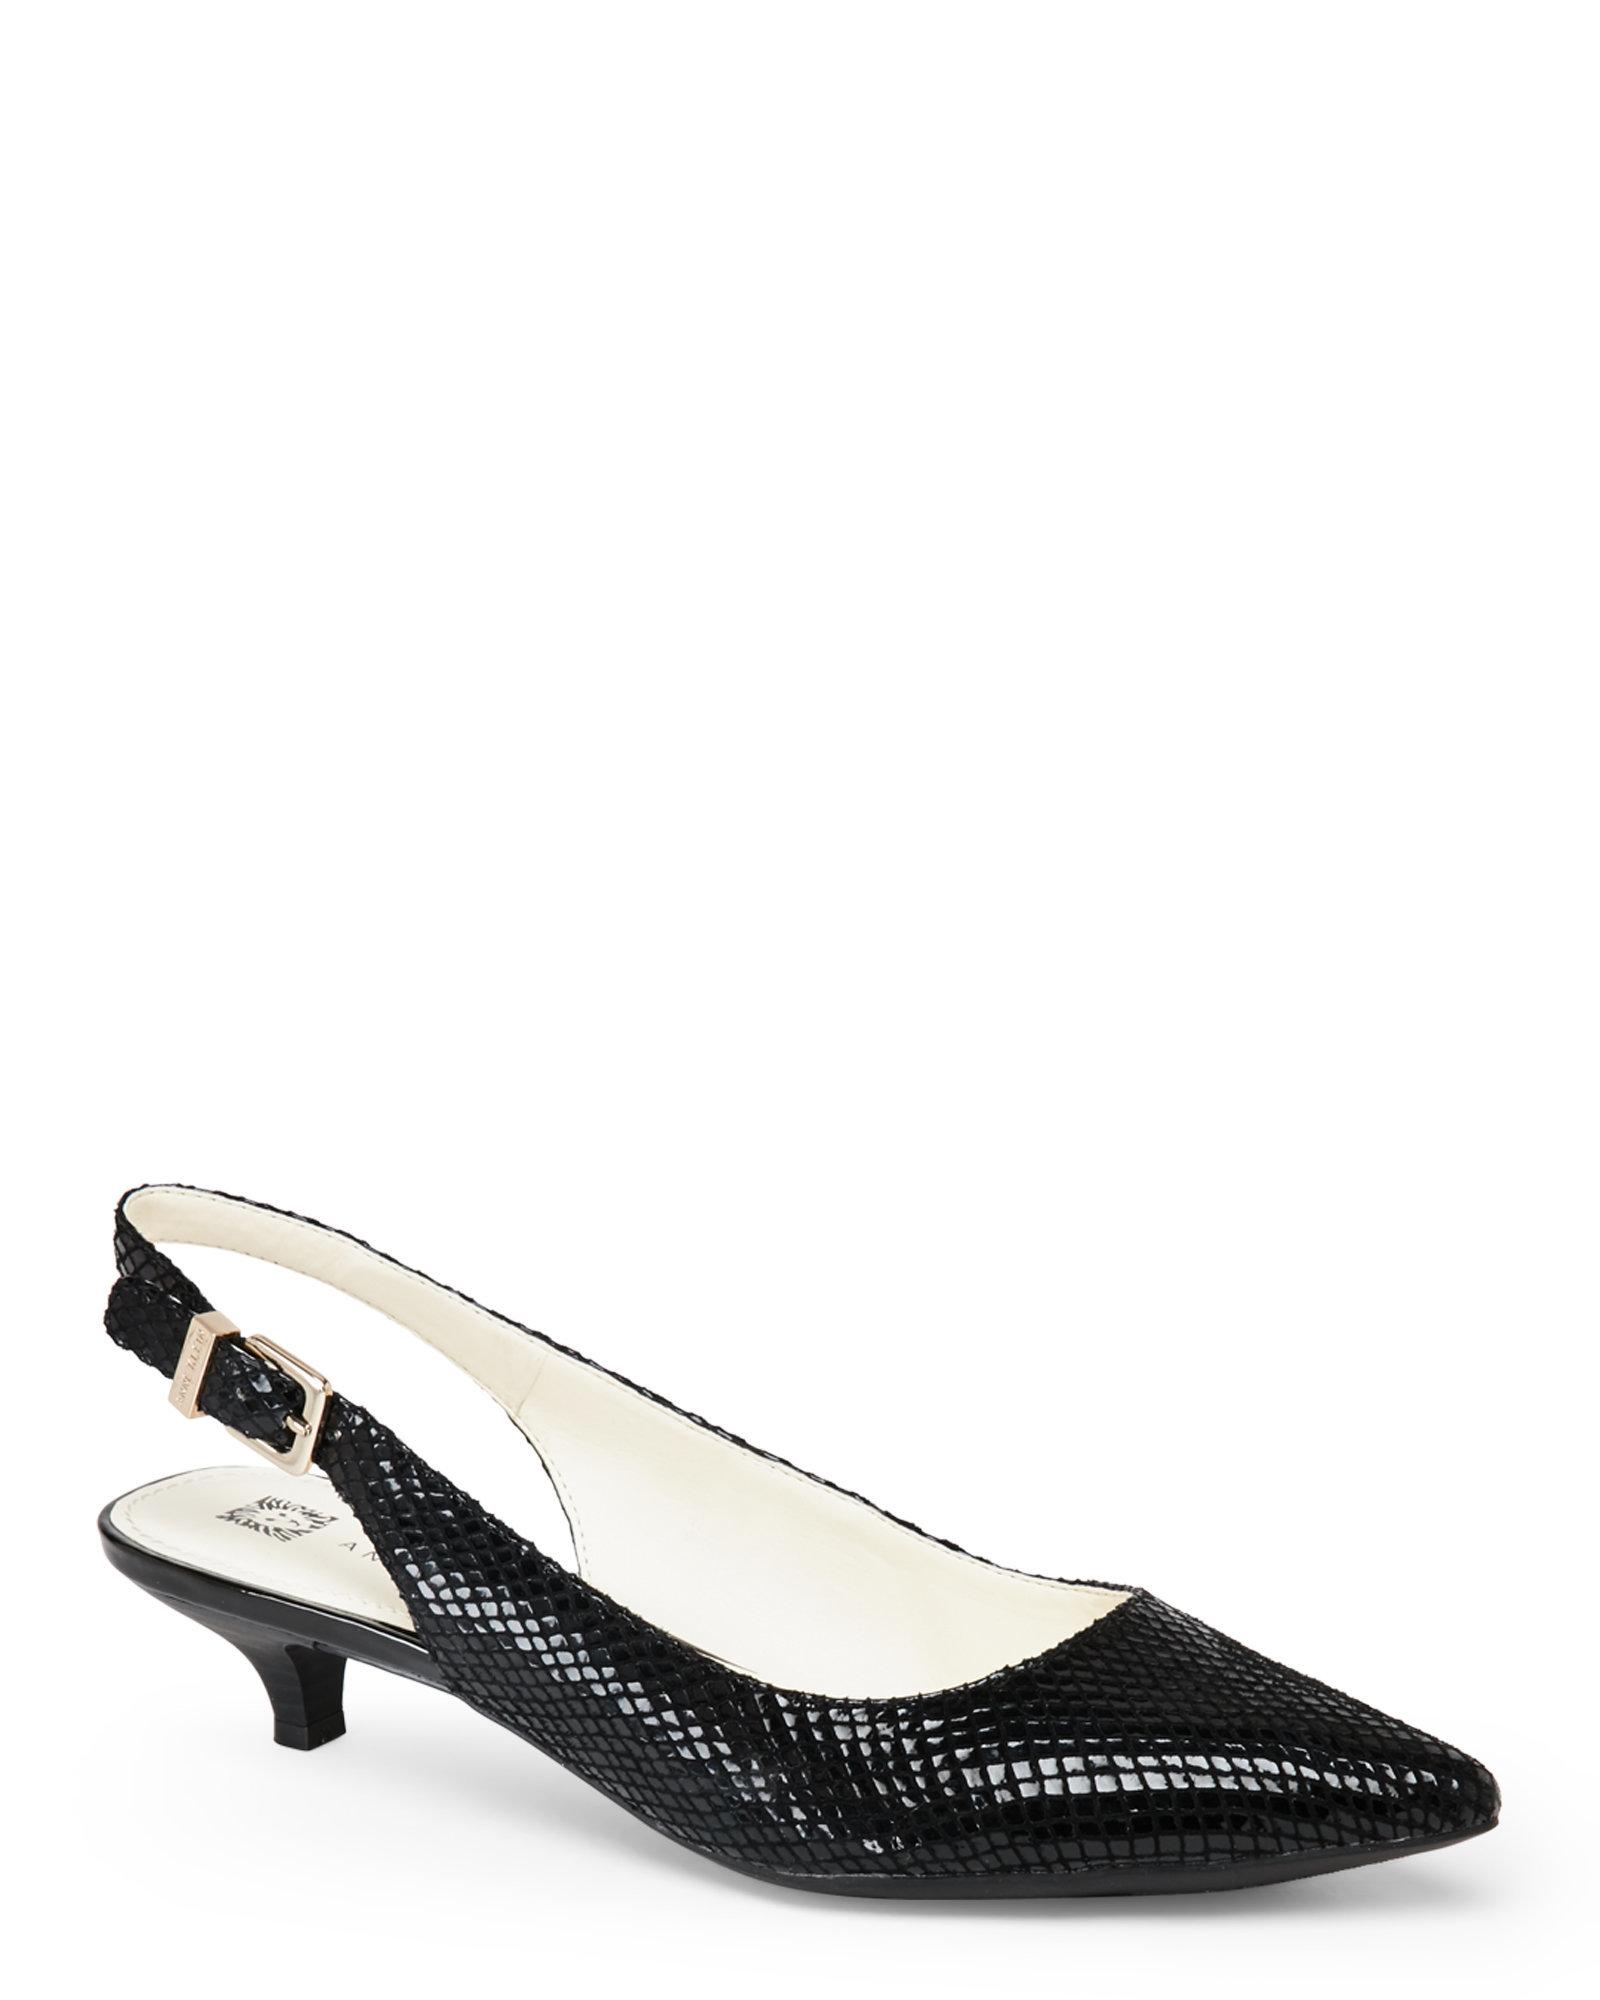 Anne Klein Low Heel Shoes